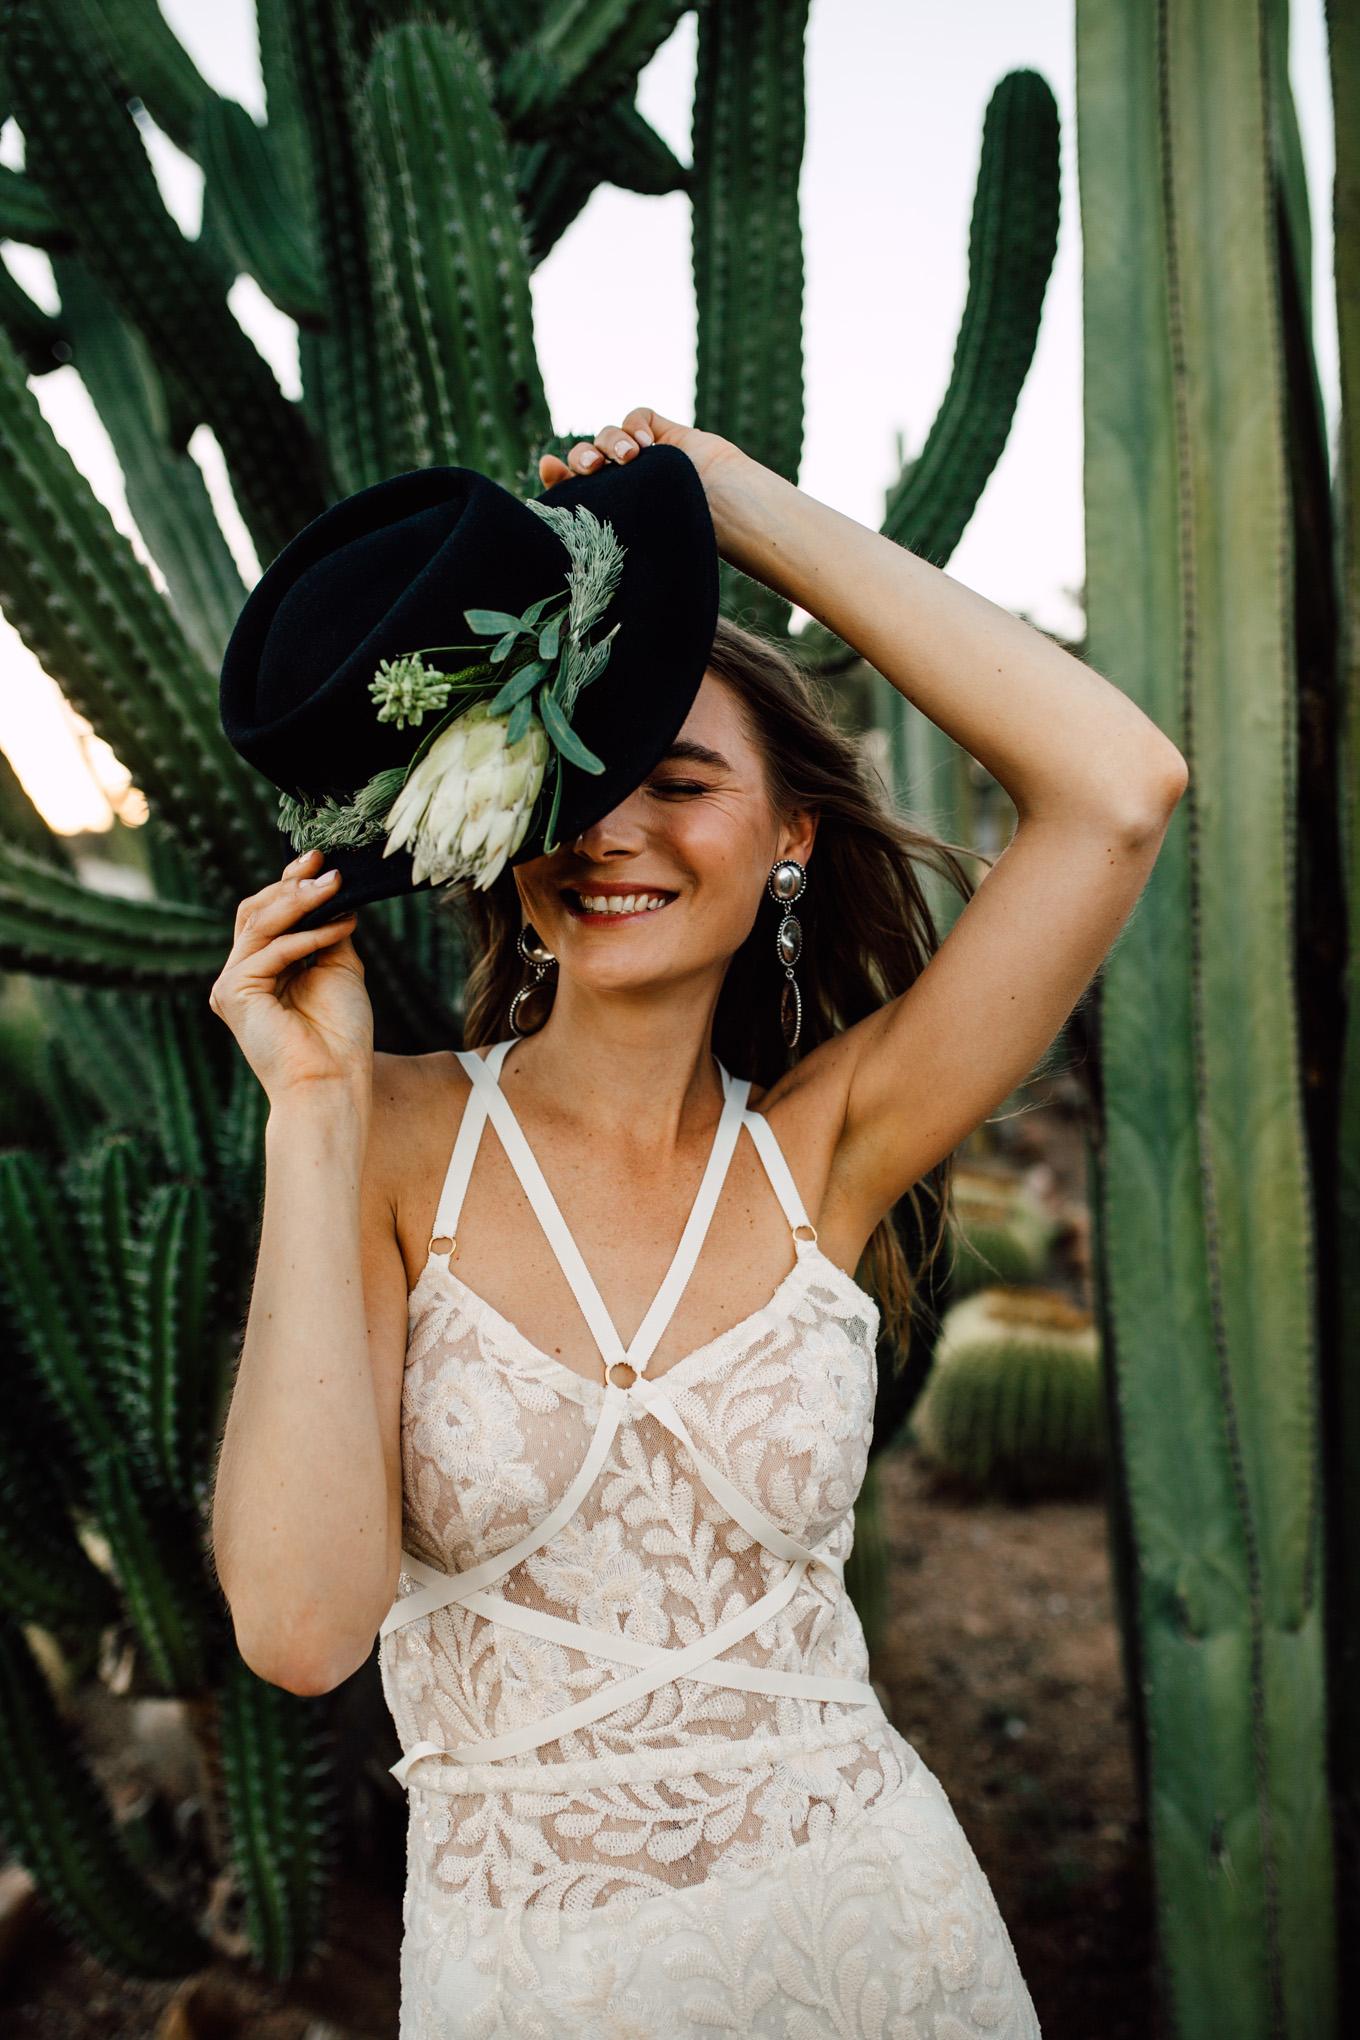 Cape-Town-Pia-Anna-Christian-Wedding-Photography-South-Africa-Bride-Cactus-10.jpg